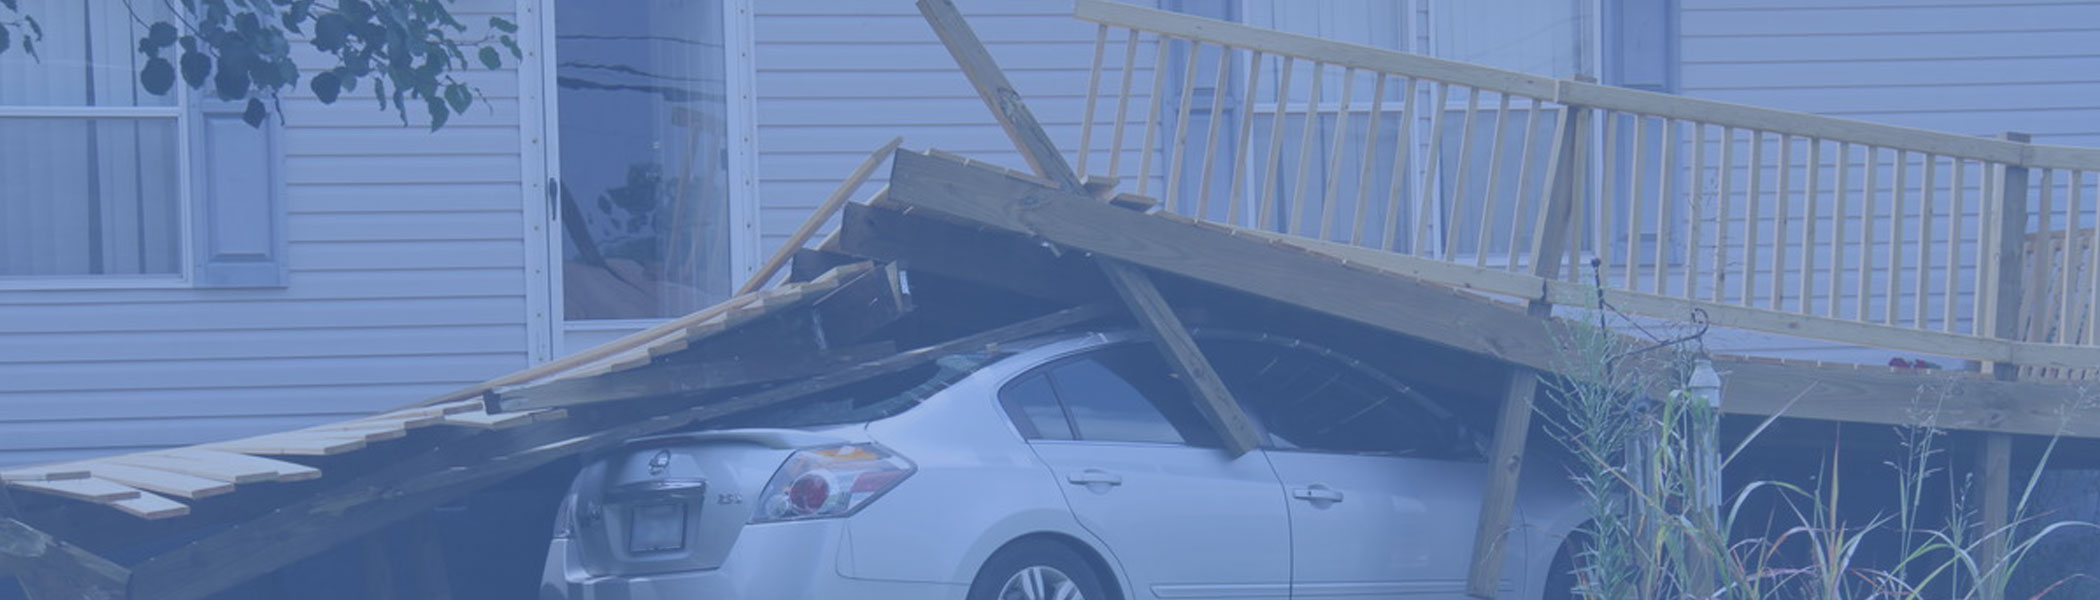 car crash into house